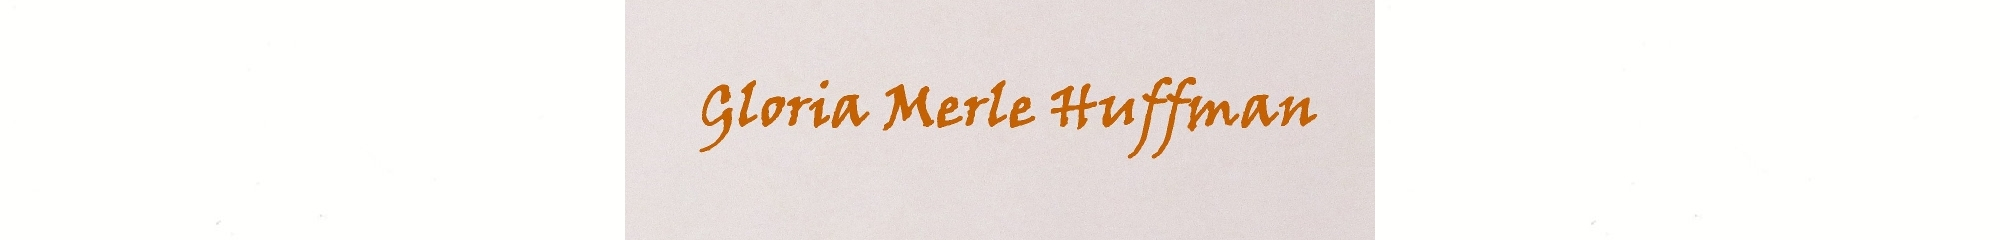 Gloria Merle Huffman